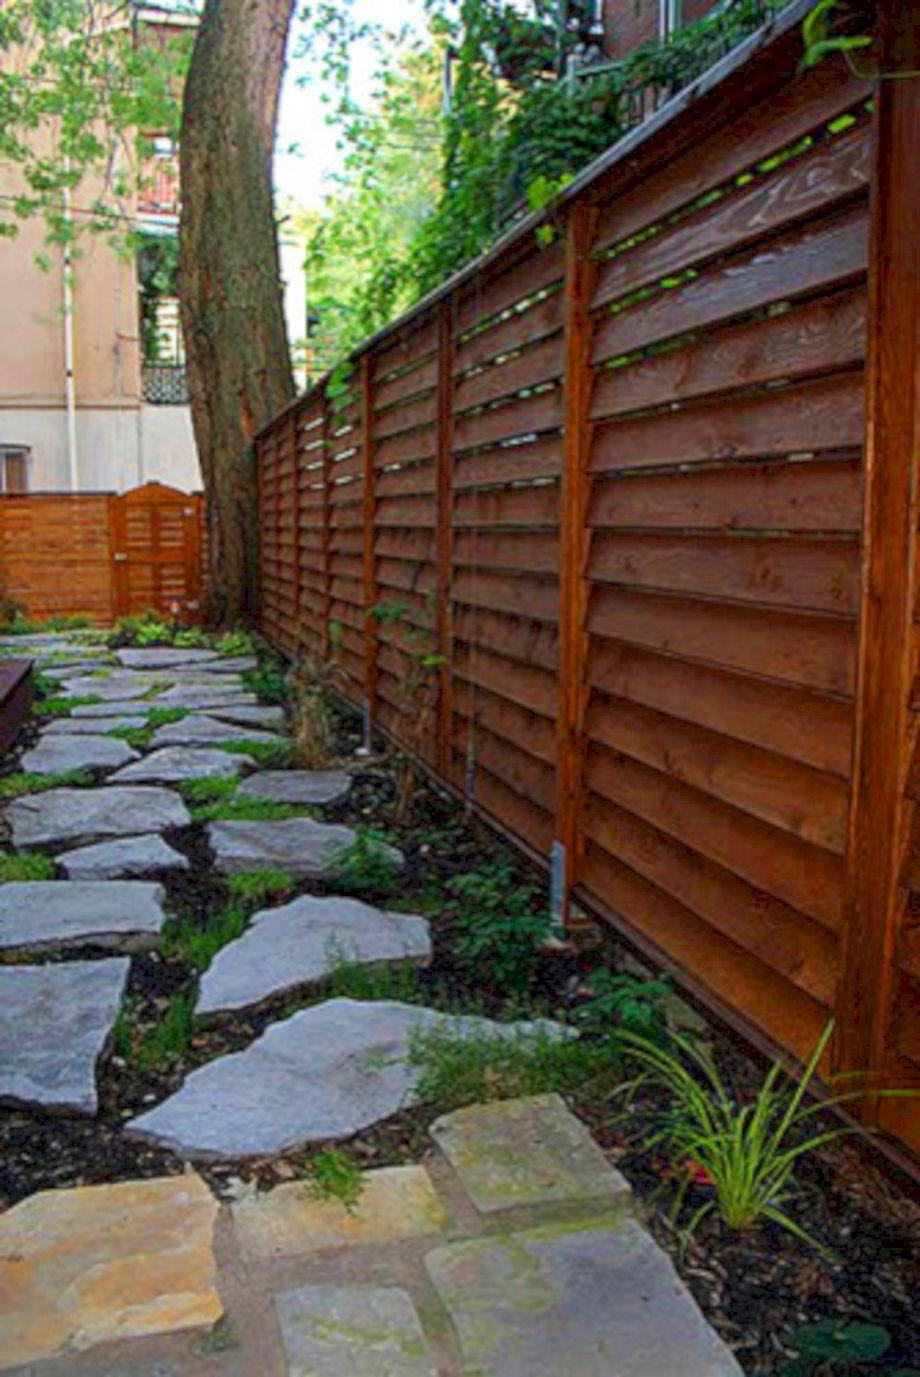 67 diy backyard privacy fence ideas on a budget backyard privacy